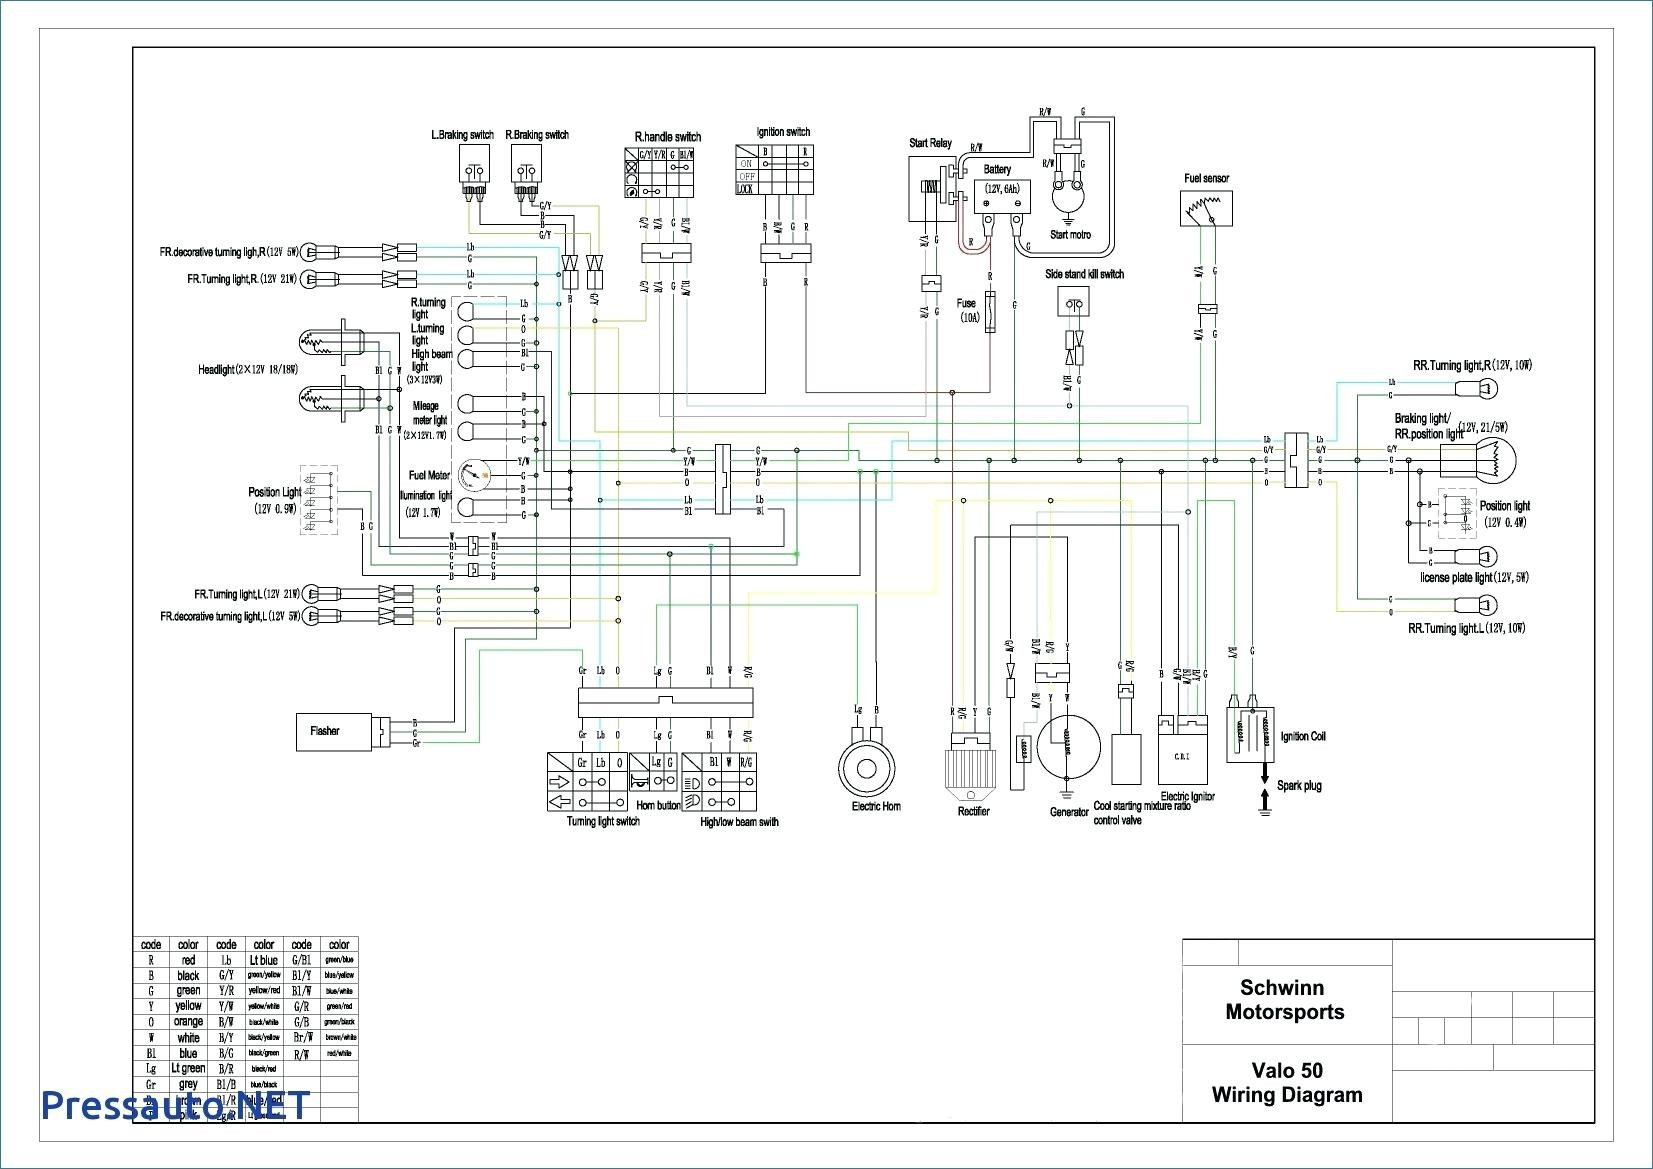 Dish Vip 222 Receiver Wiring Diagram Libraries Installation Free Download Diagrams Pictures 722k Diagramsdish Schematics 222k